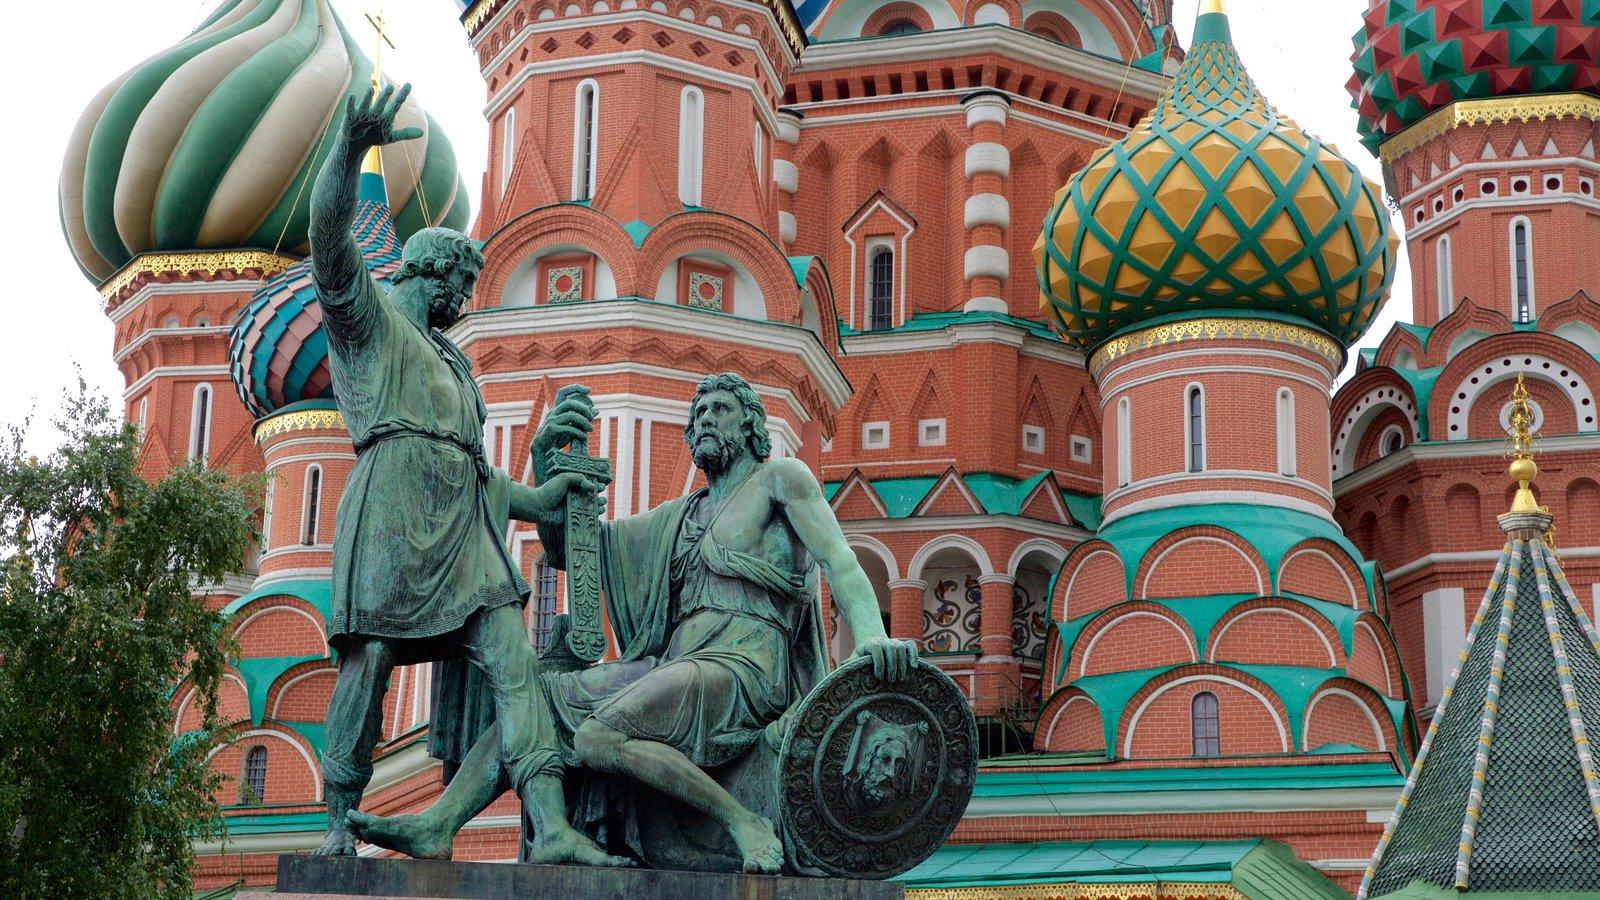 Monumento a Minin y Pozharski mostrando una estatua o escultura y patrimonio de arquitectura